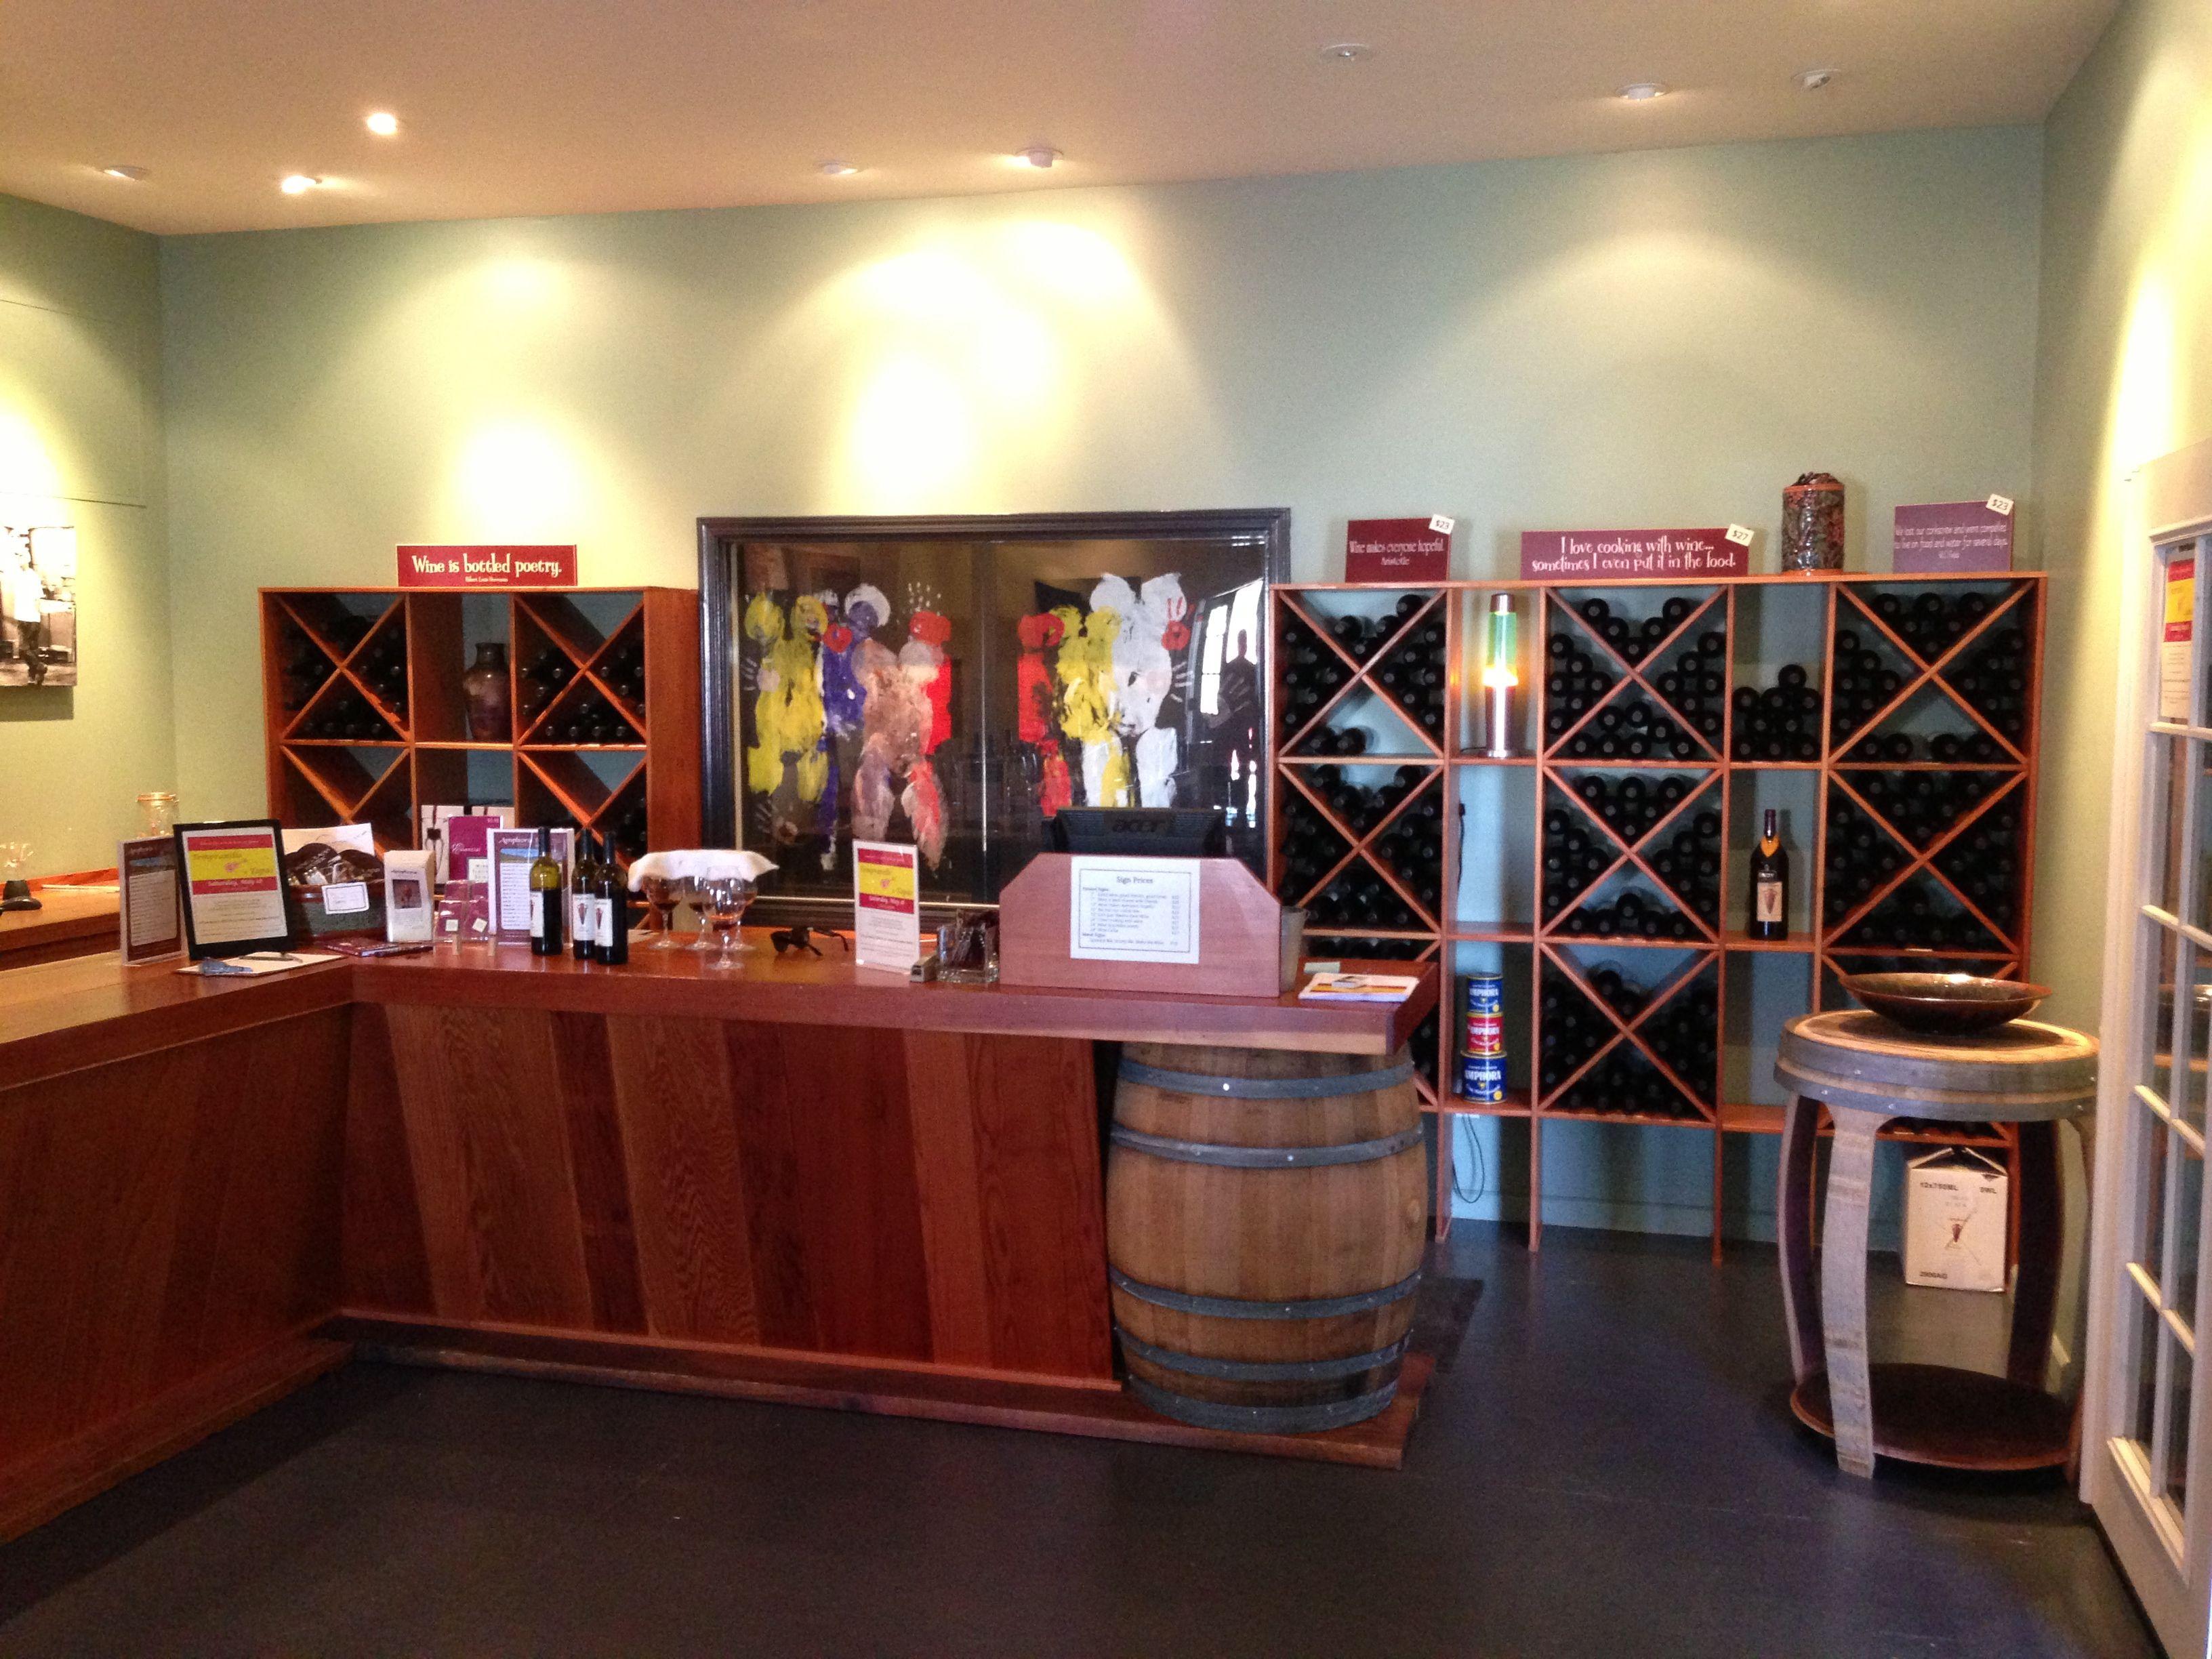 Healdsburg Wine Tours Sonoma Napa Limousine Service Winery Tasting Room Tasting Room Napa Valley Trip